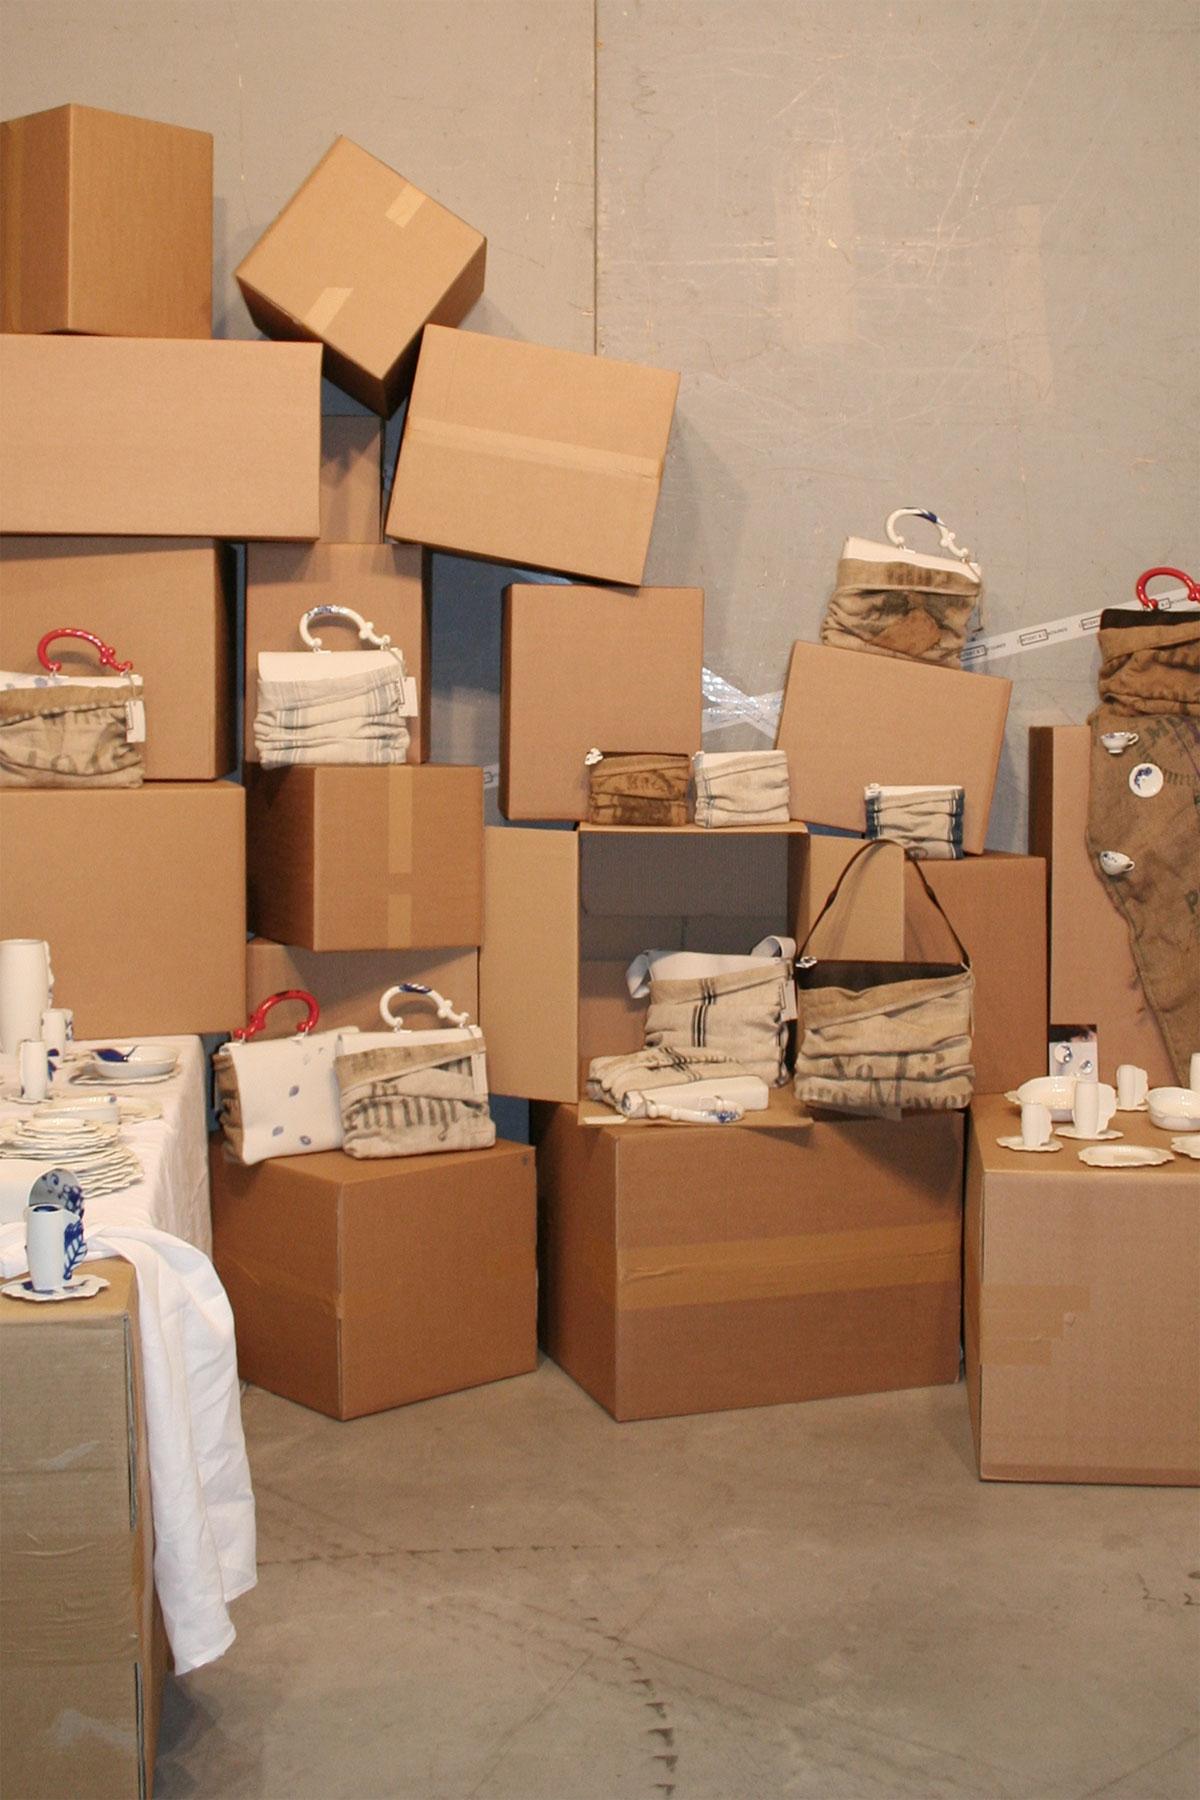 maison et objet 01 11 exhibitions content container by pia pasalk. Black Bedroom Furniture Sets. Home Design Ideas